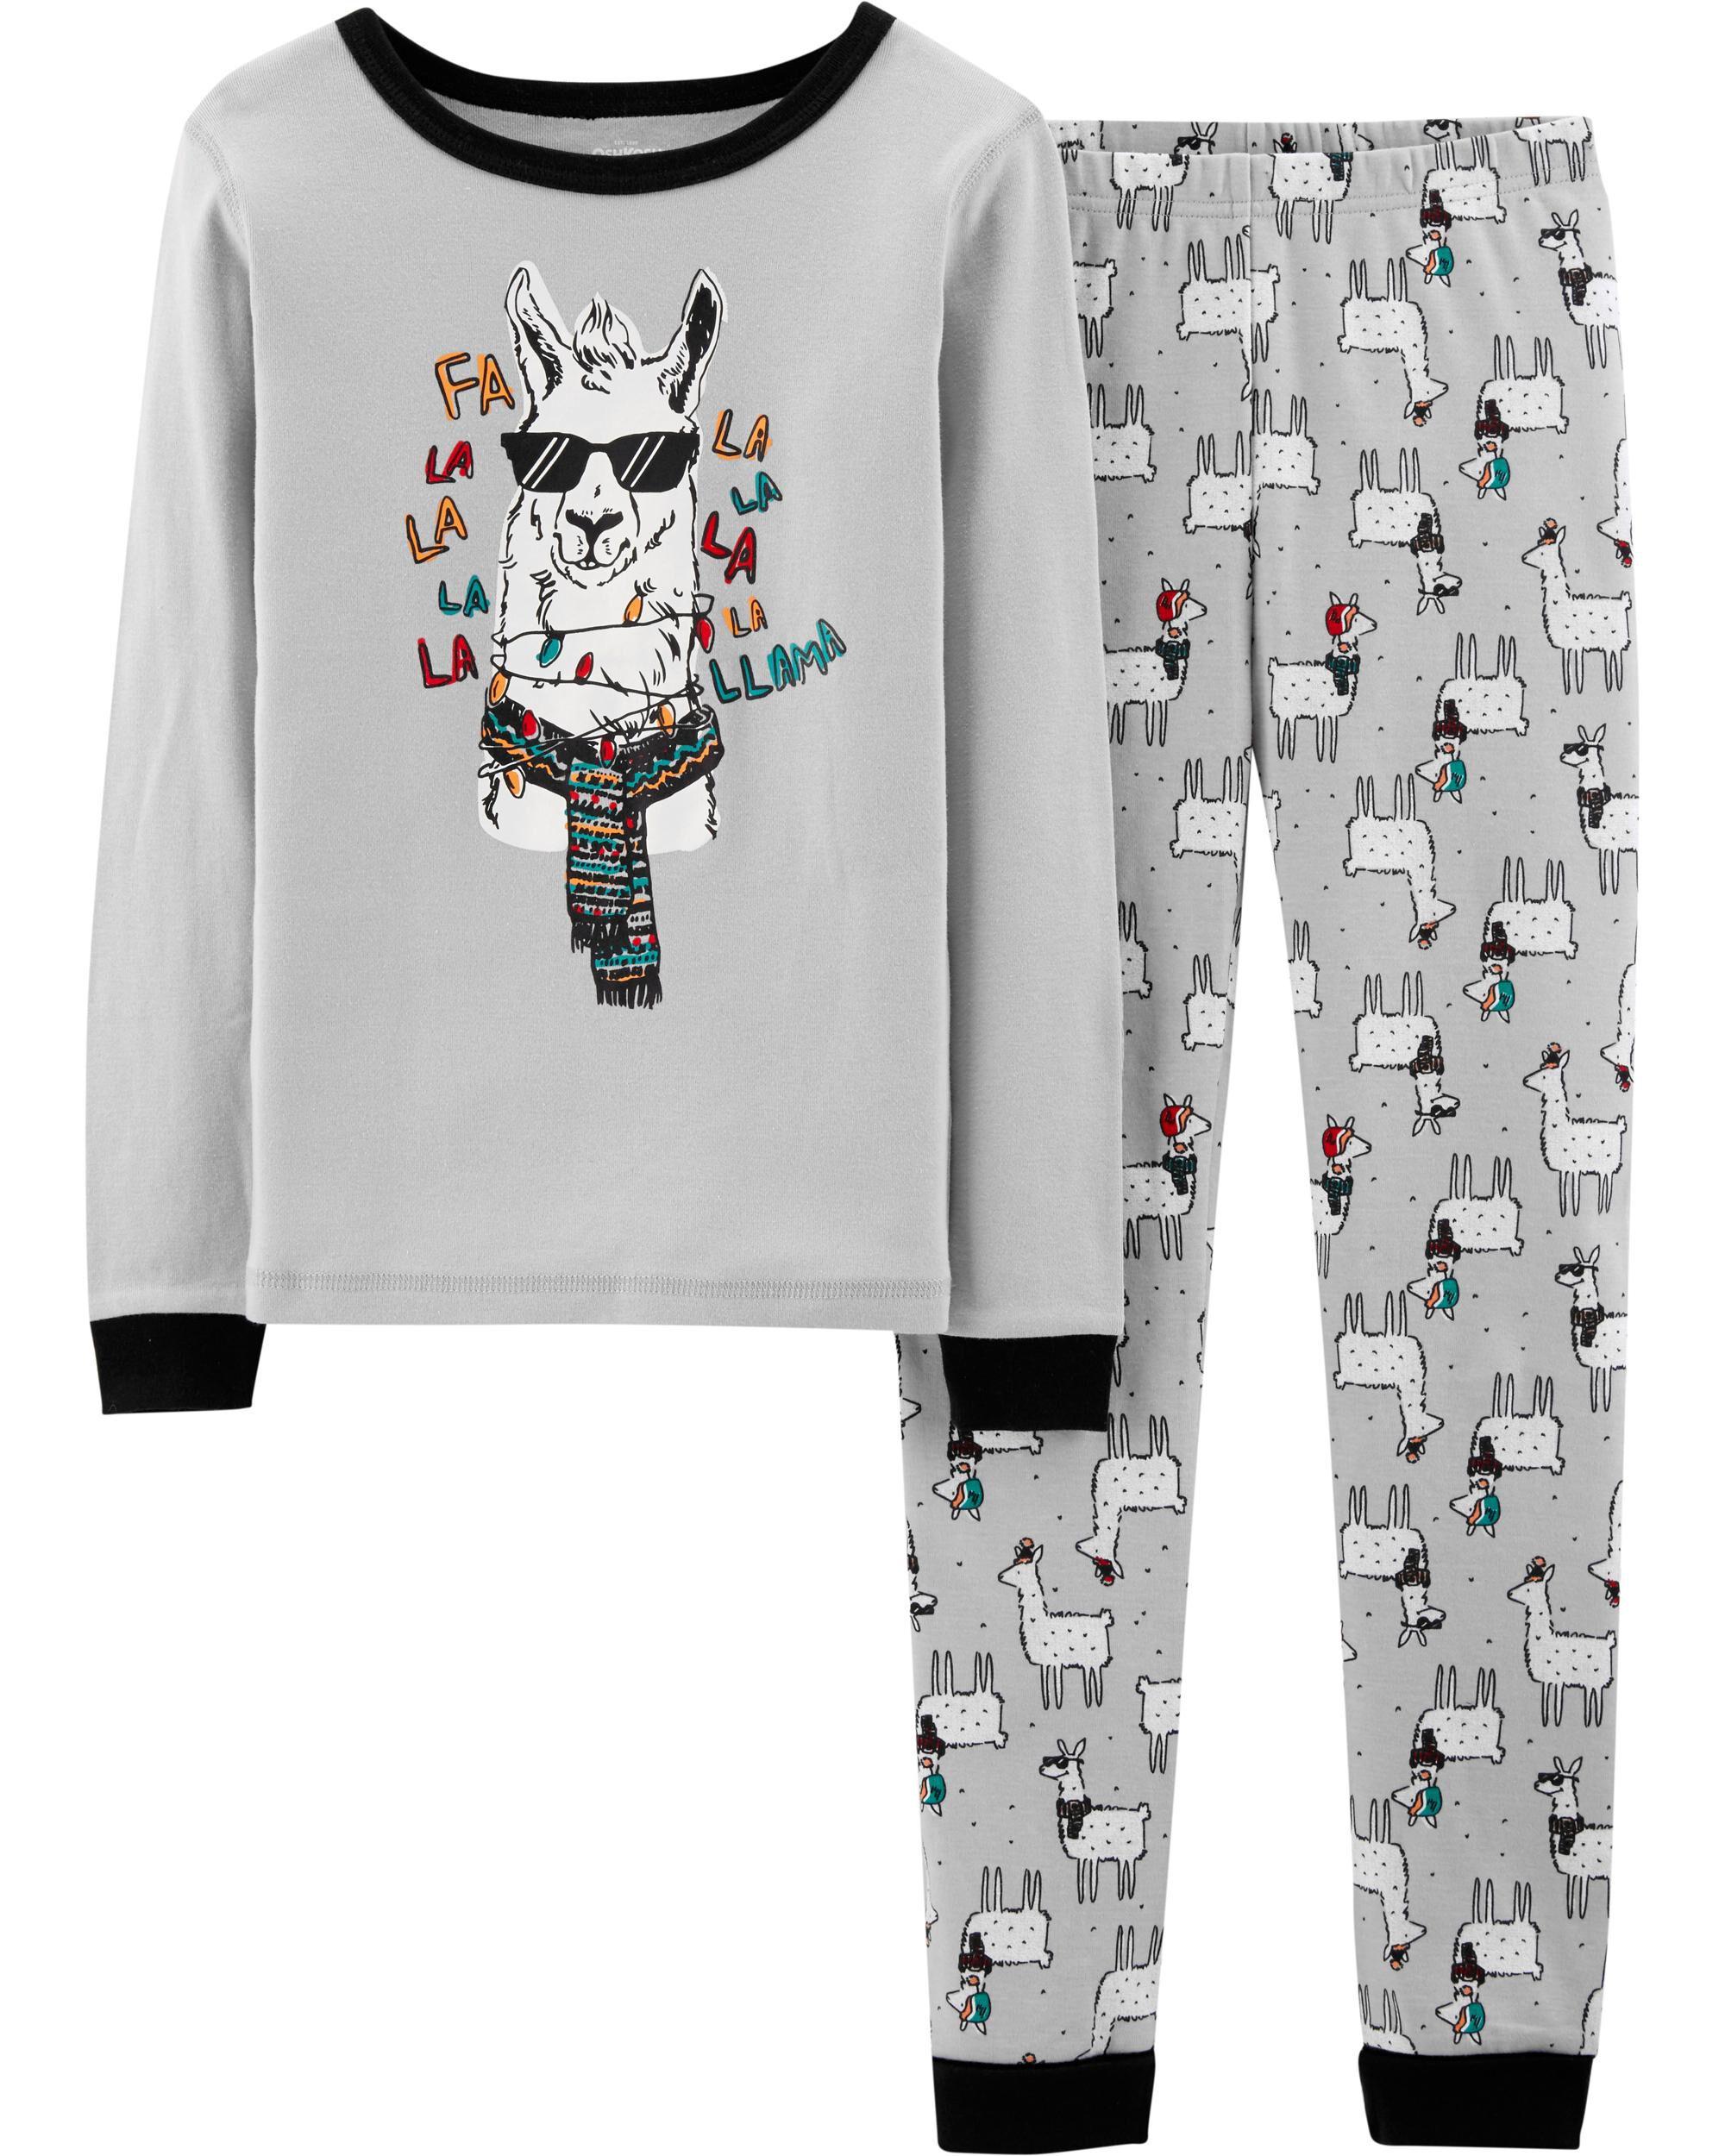 Snug Fit Christmas Llama Cotton PJs | OshKosh.com